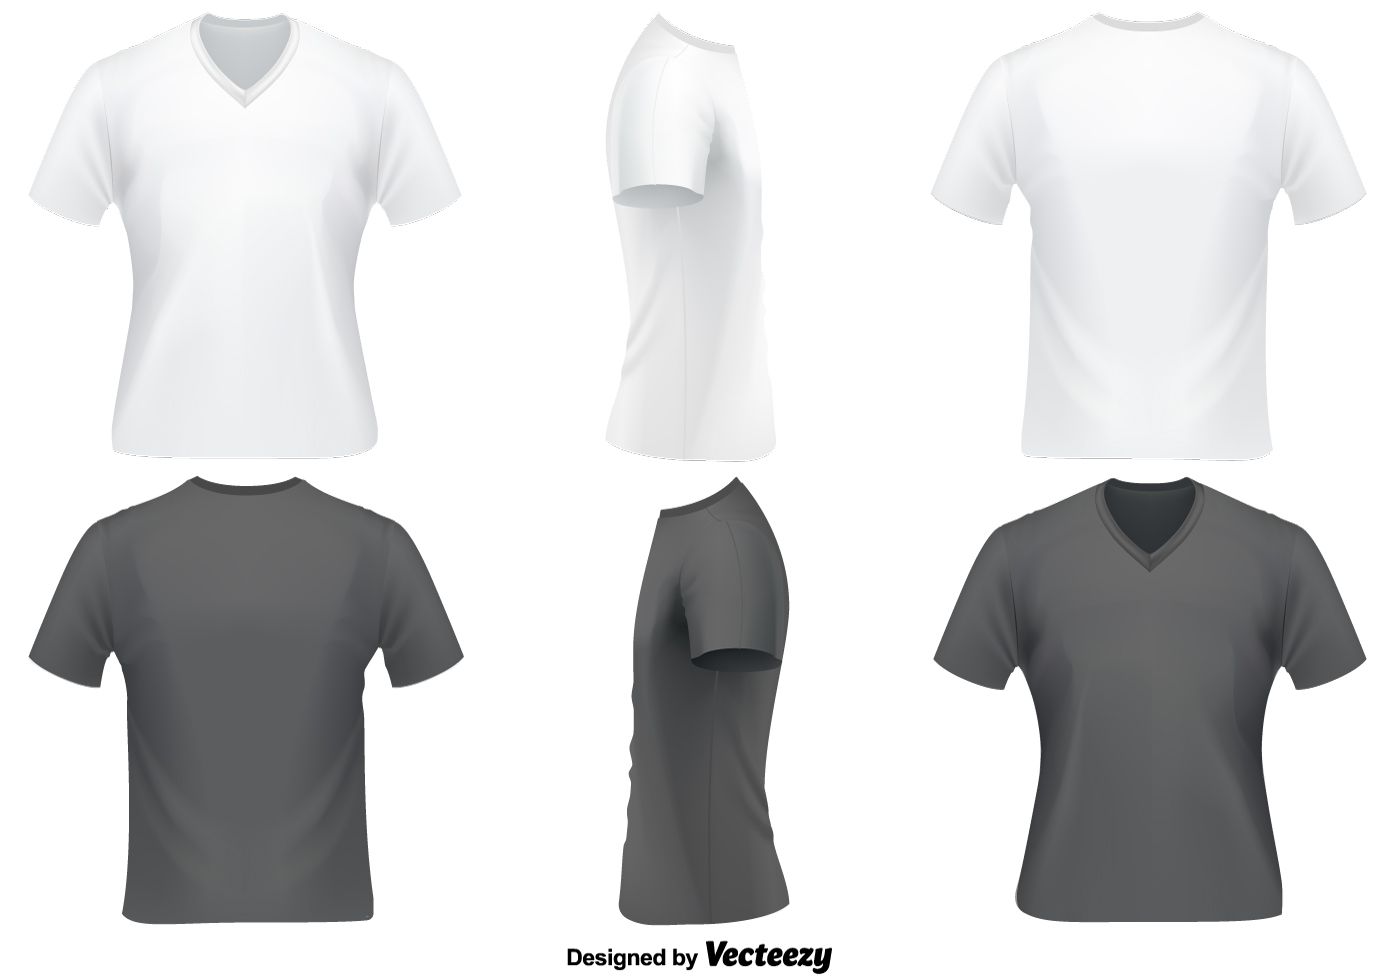 Vector Set V-Ausschnitt T-Shirt Vorlage - Kostenlose Vektor-Kunst ...